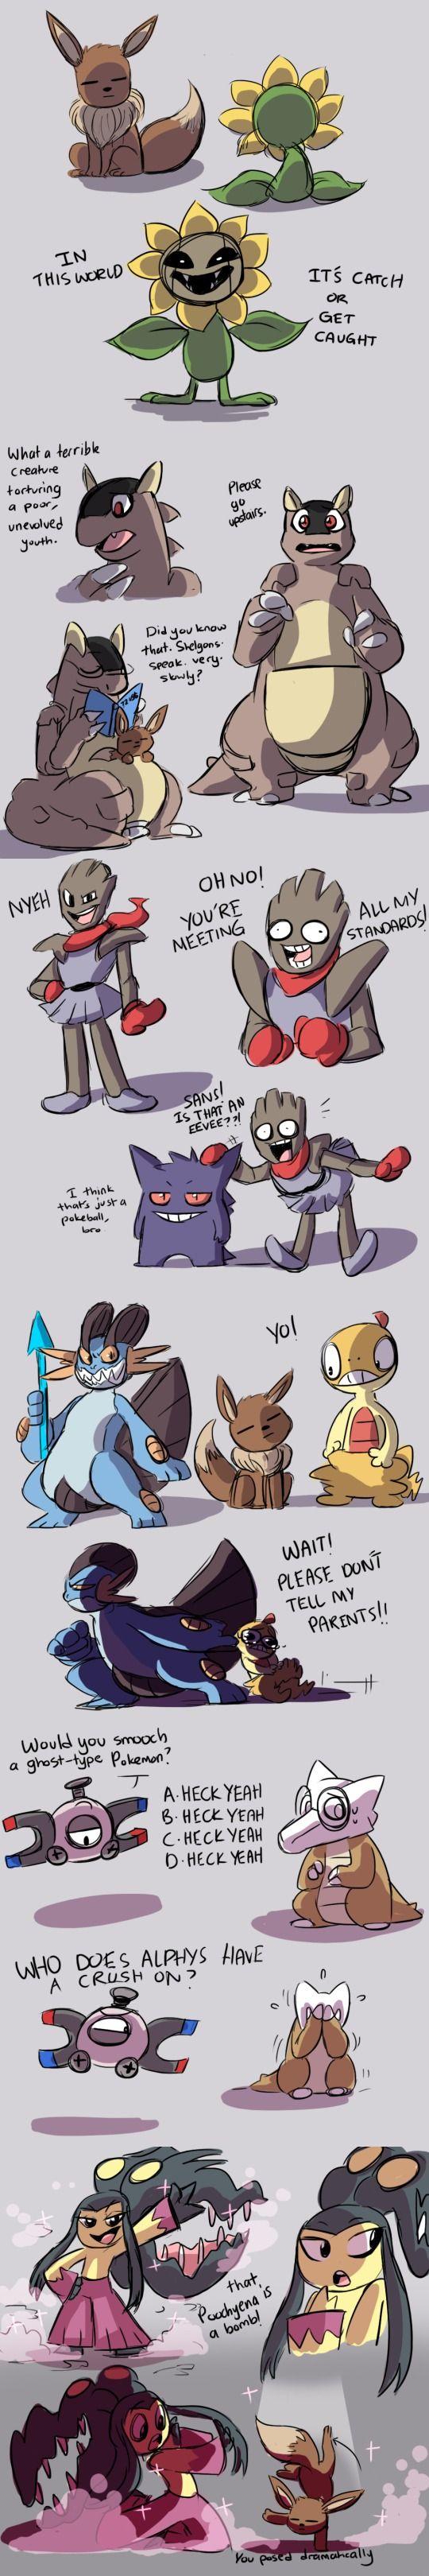 Undertale - pokemon parody